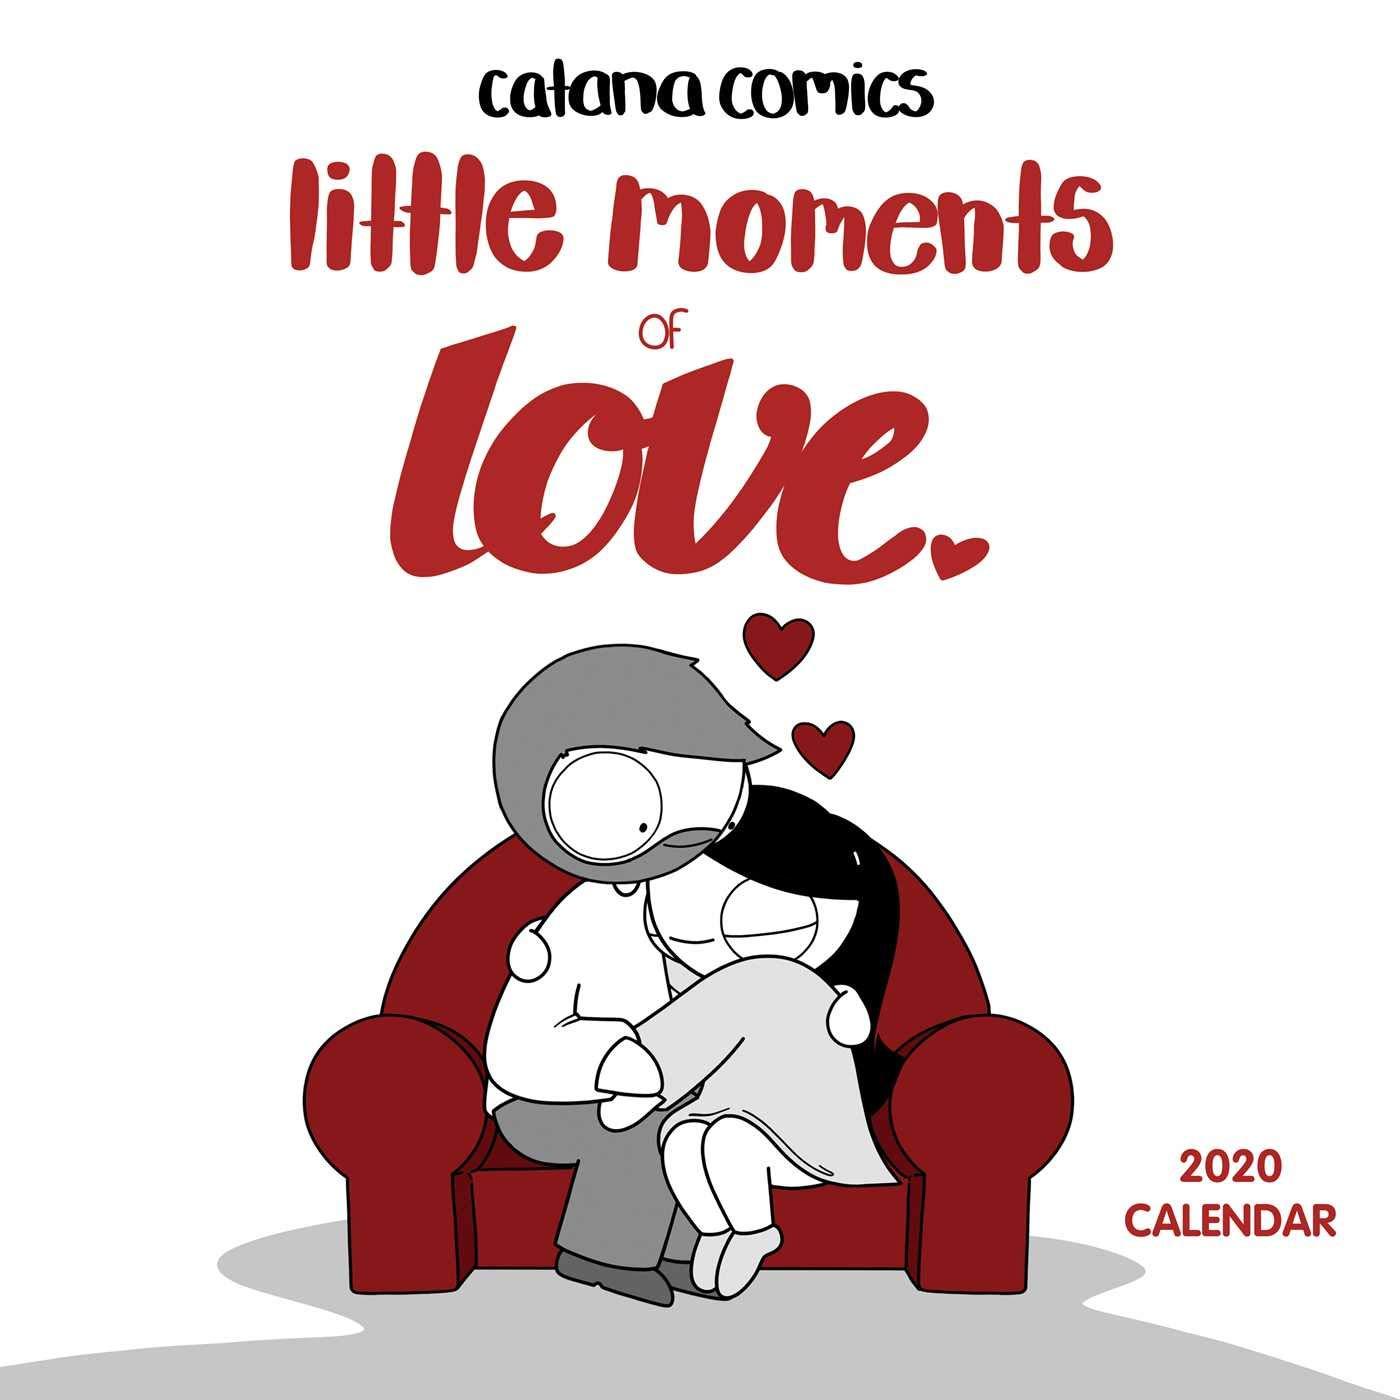 Best Indie Comics Of 2020 Catana Comics Little Moments of Love 2020 Wall Calendar: Catana